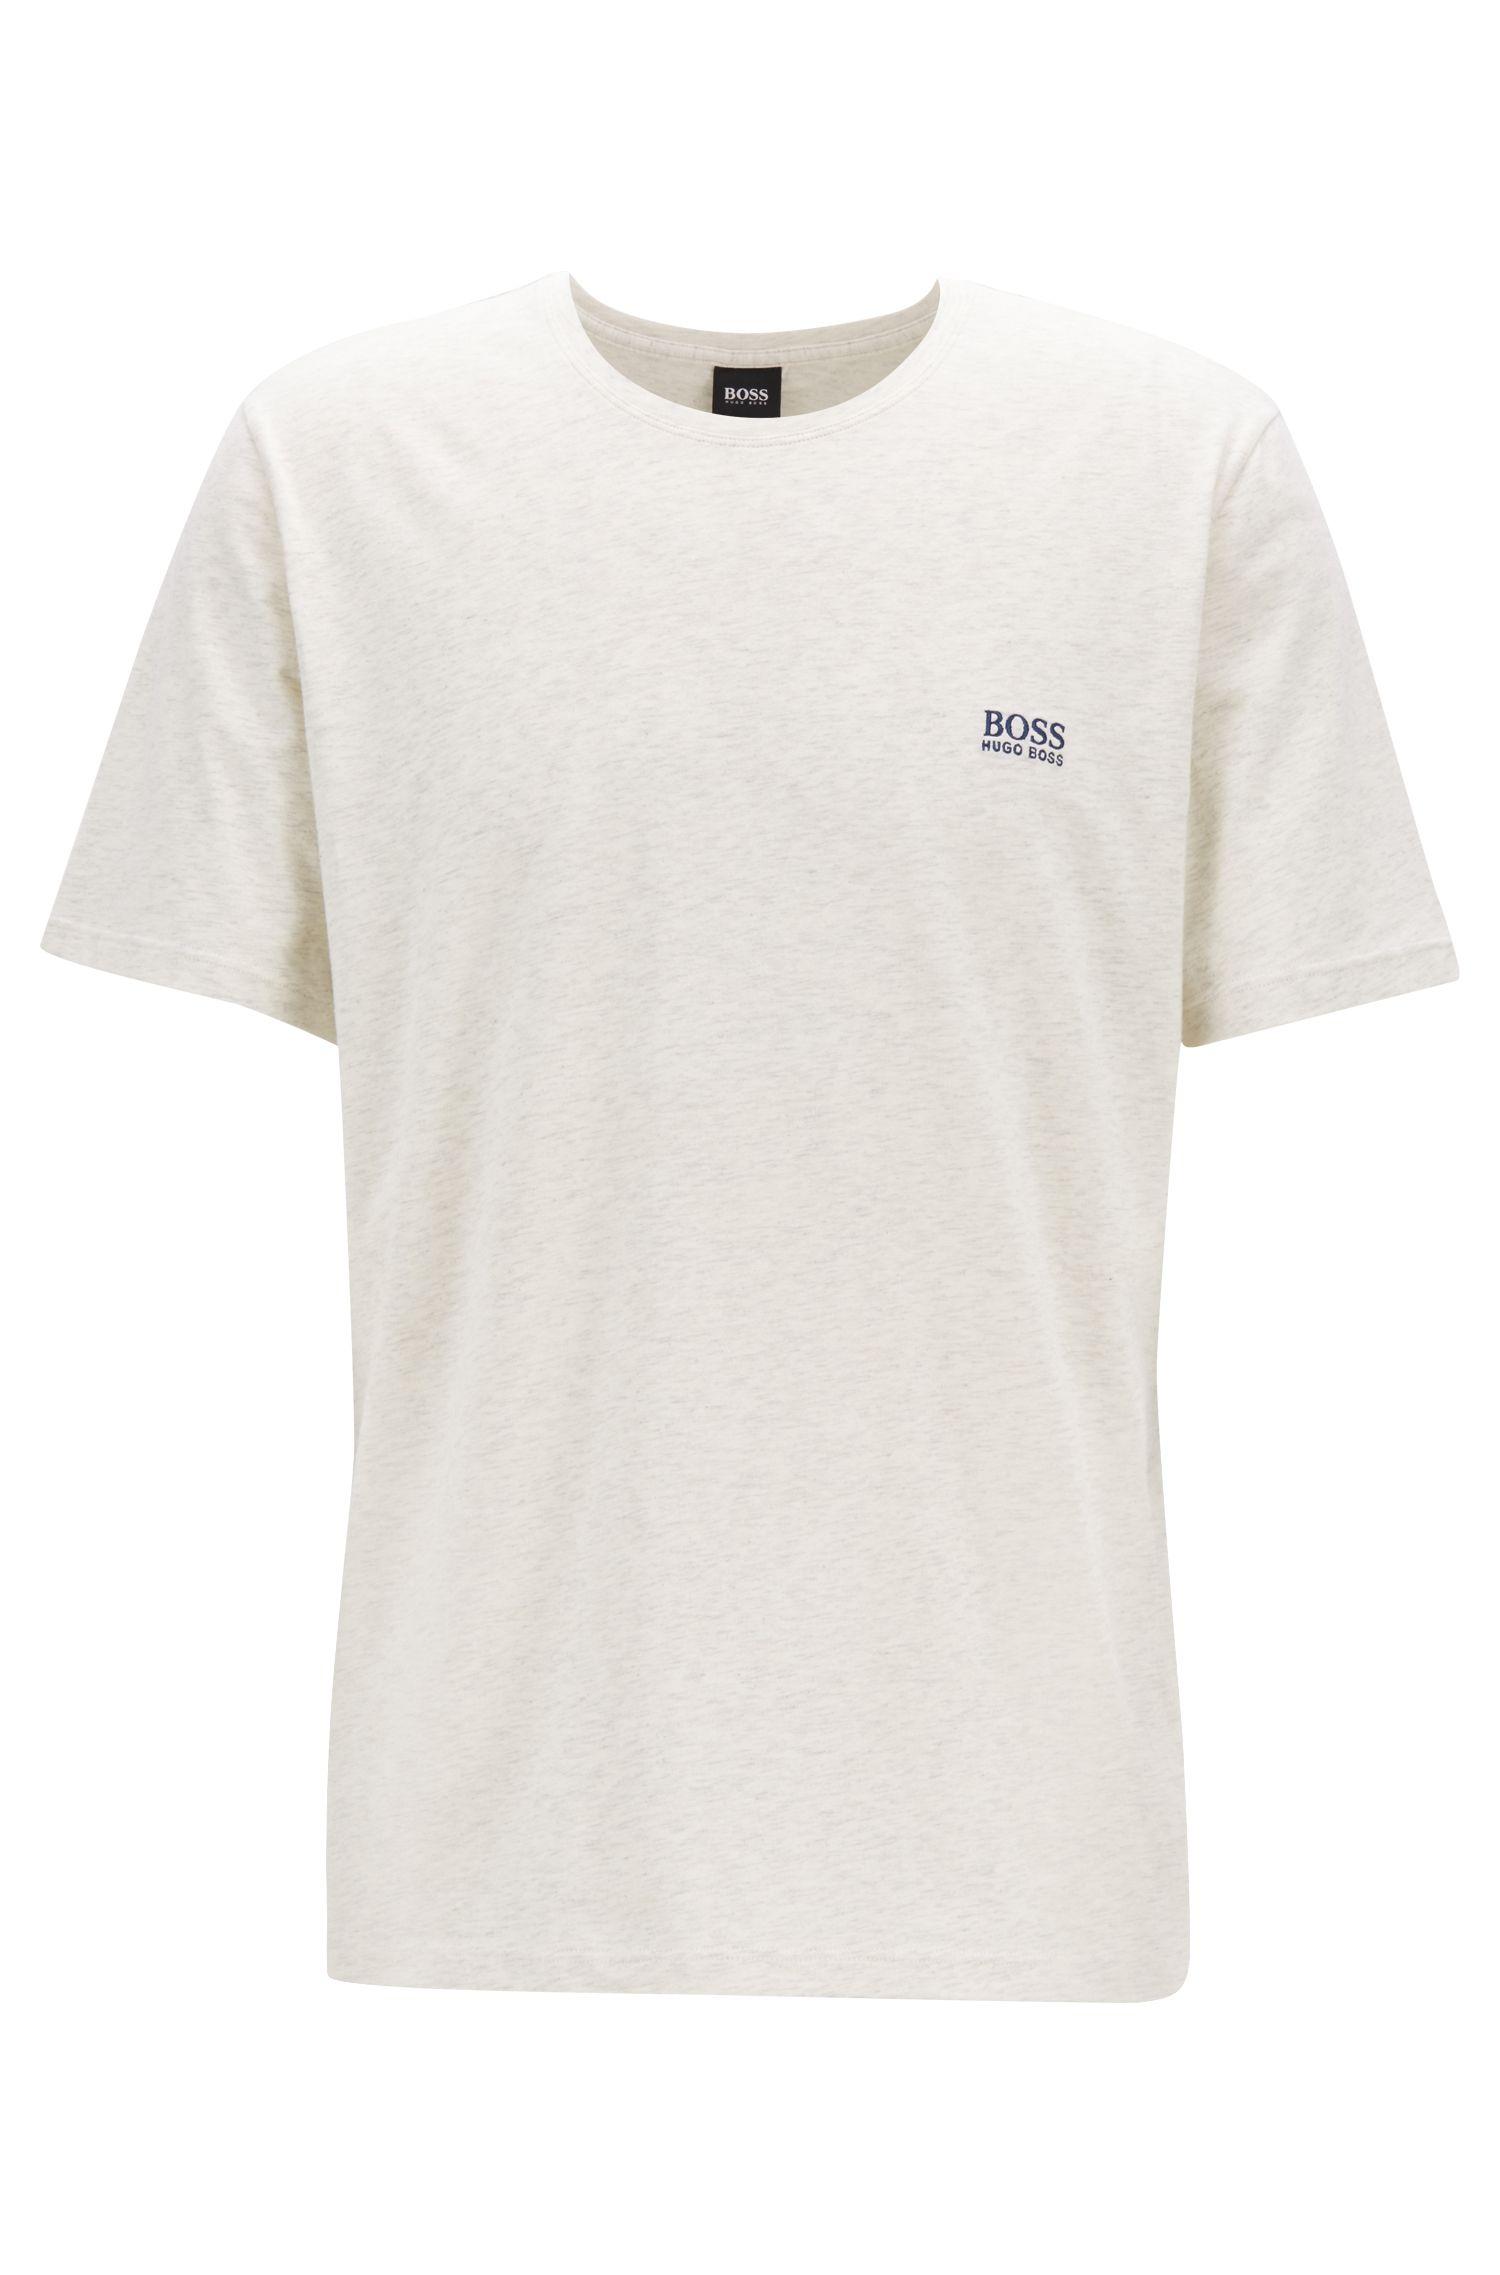 Loungewear T-shirt in stretch cotton, Grey